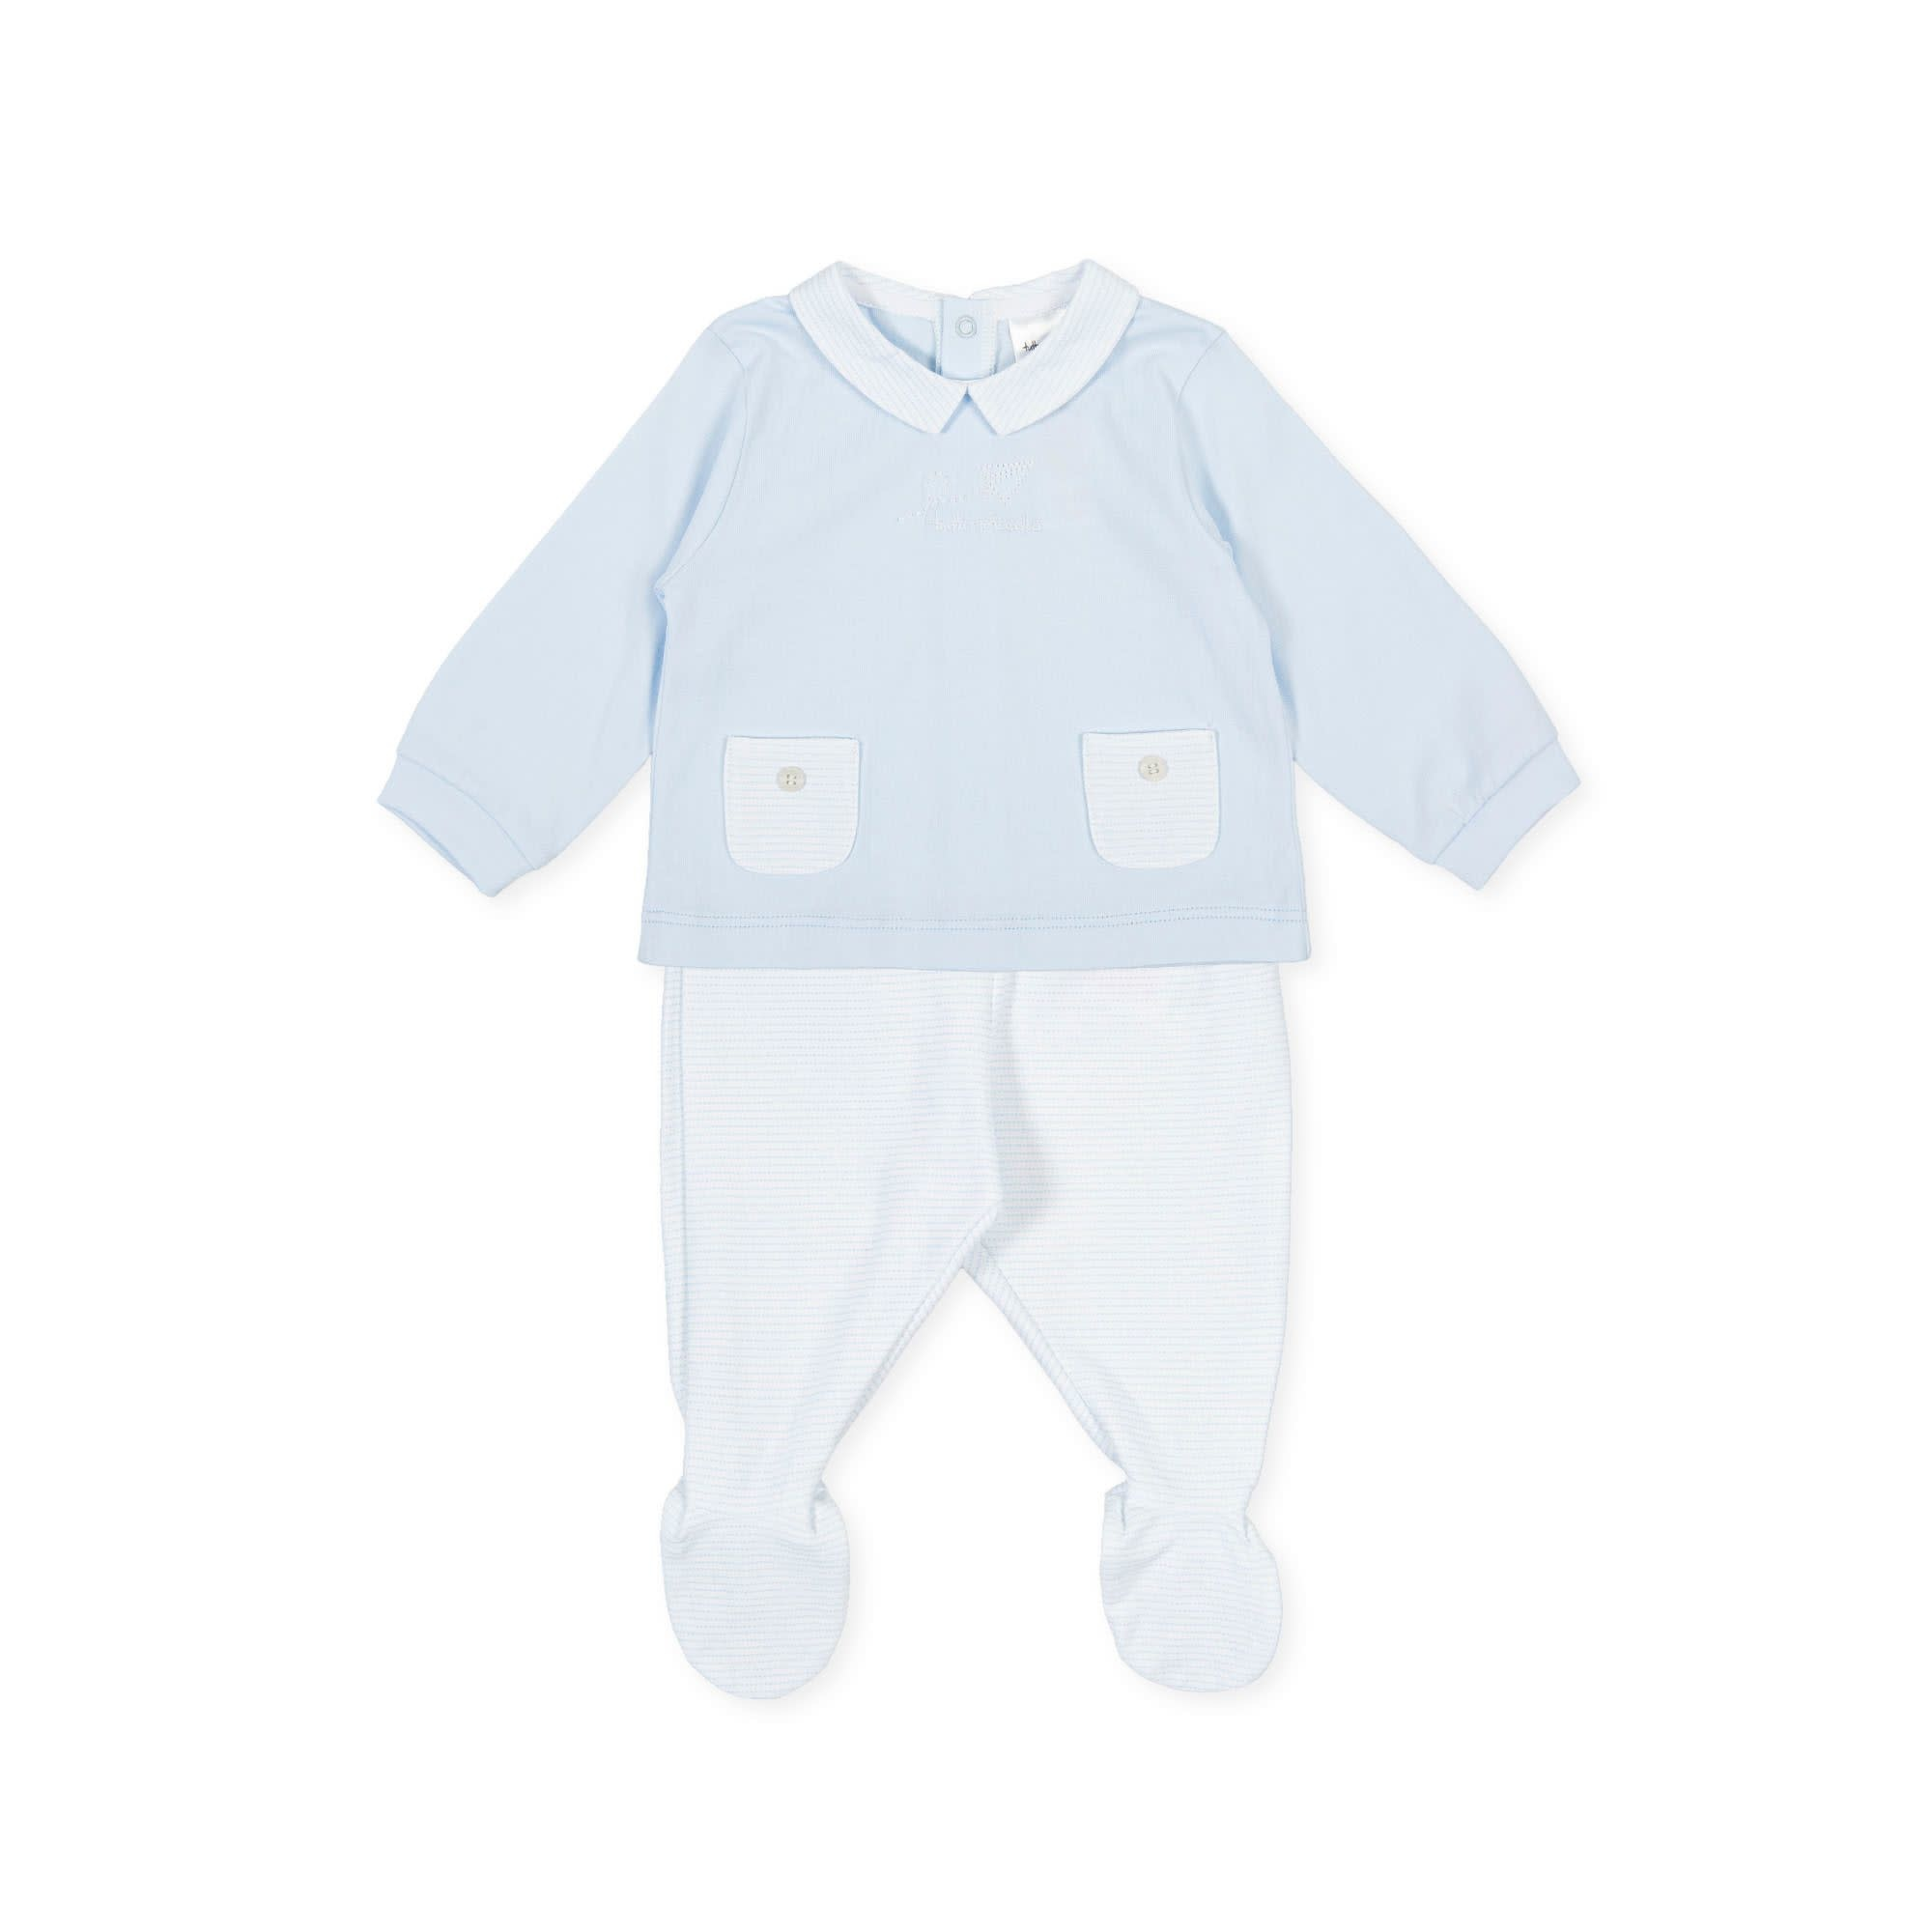 Tutto Piccolo 2 Piece Babygrow 1888s21